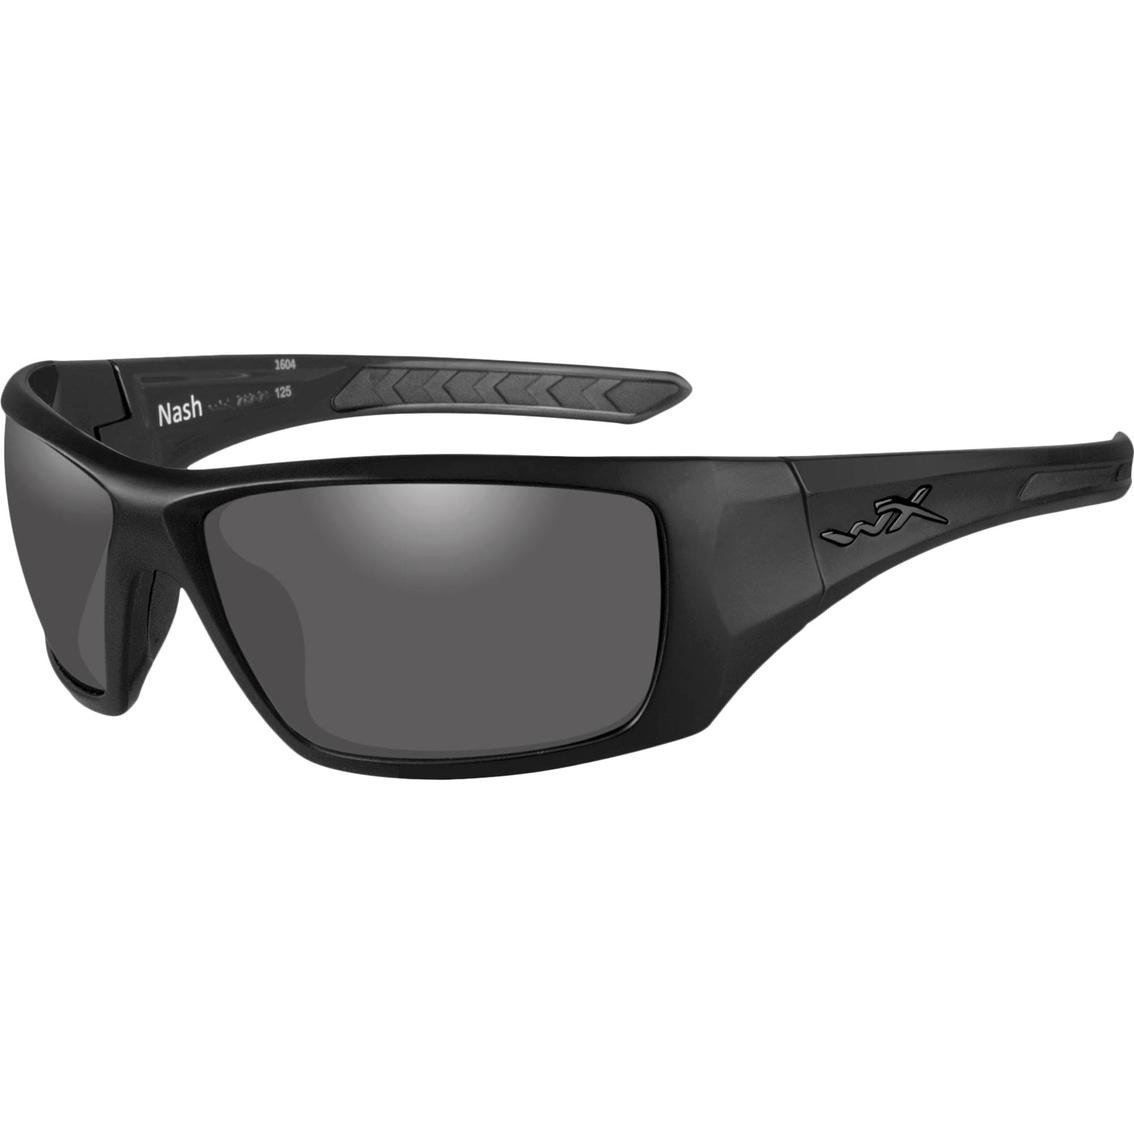 7290fcda4c Wiley X Nash Sunglasses Acnas01